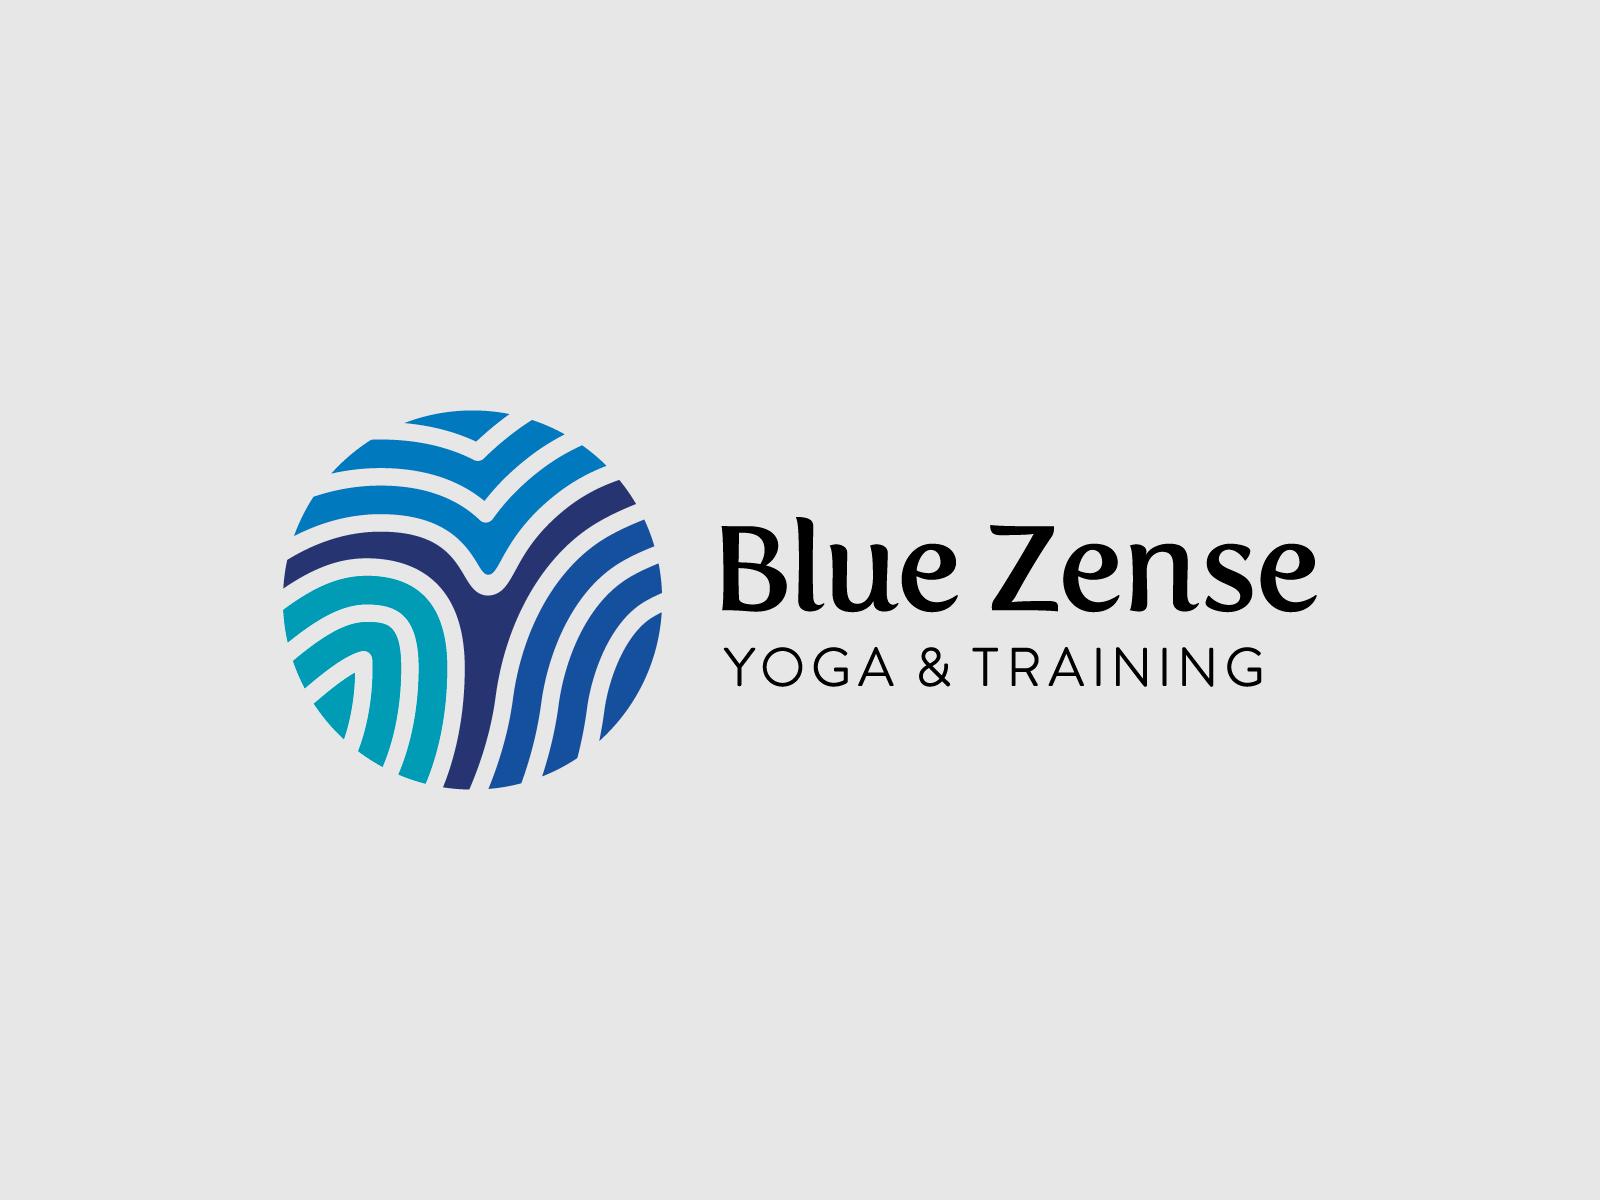 Blue Zense logo